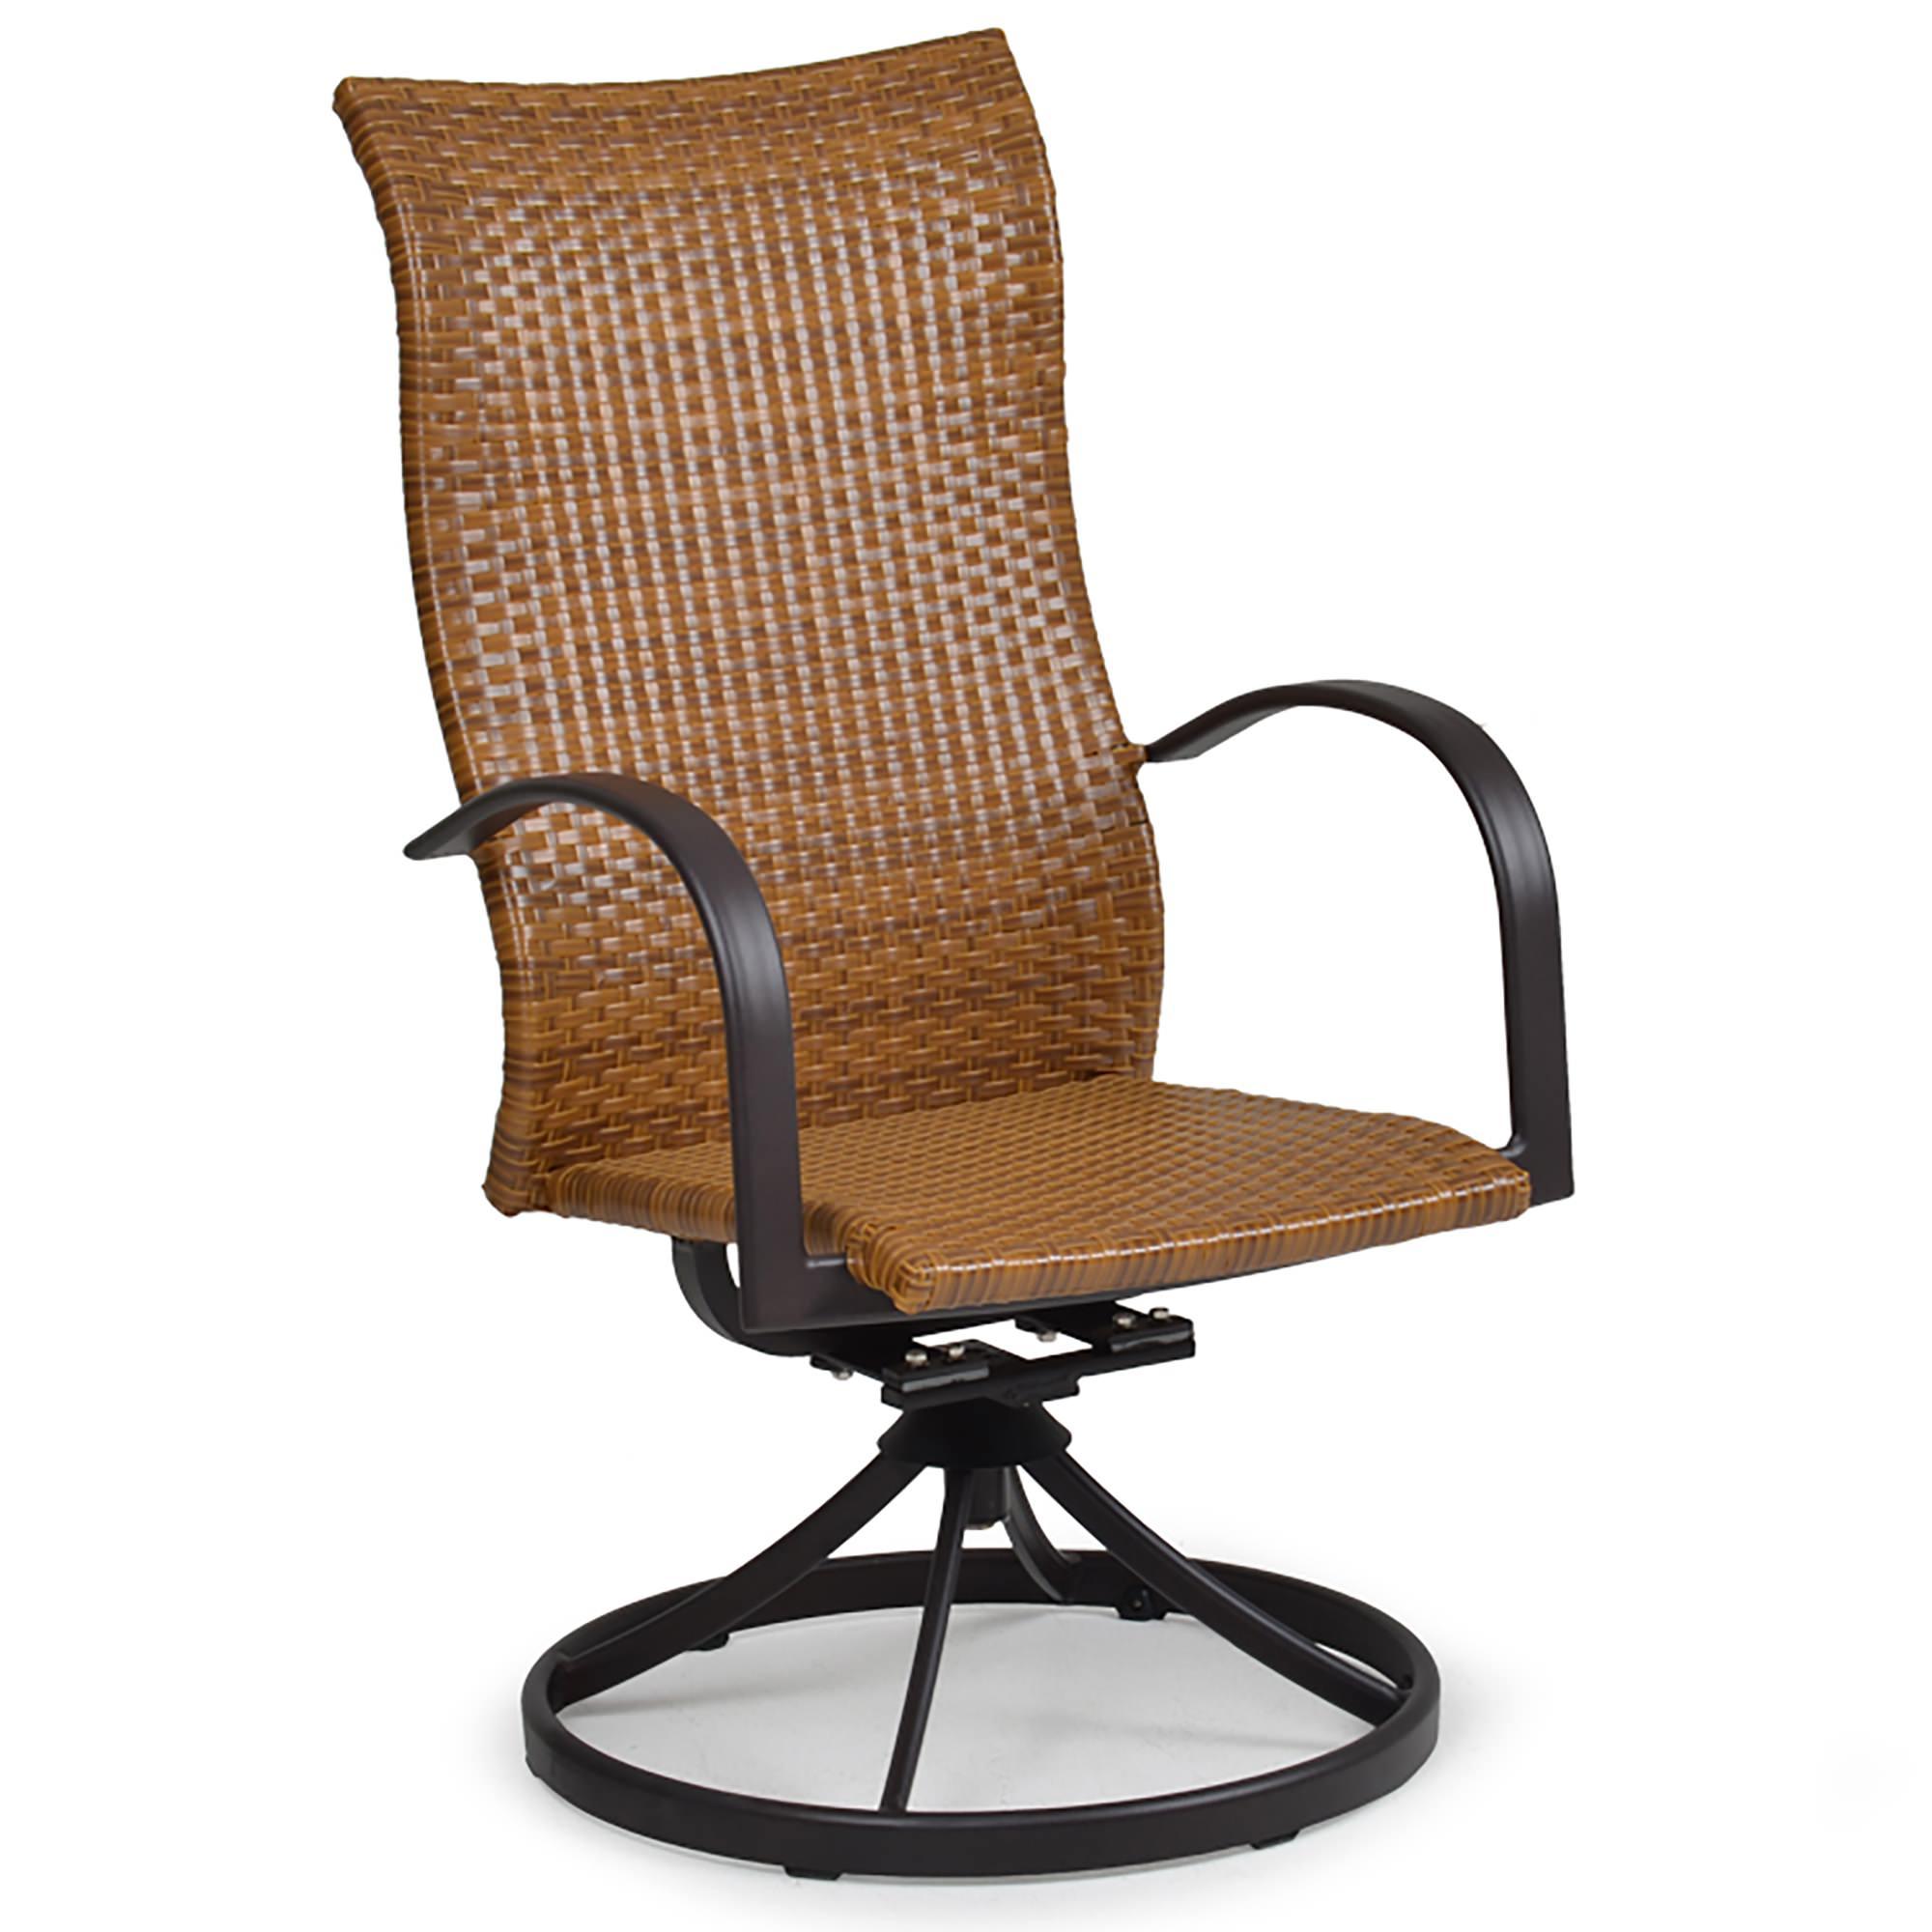 Watermark Living Resin Wicker High Back Swivel Rocker Dining Chair